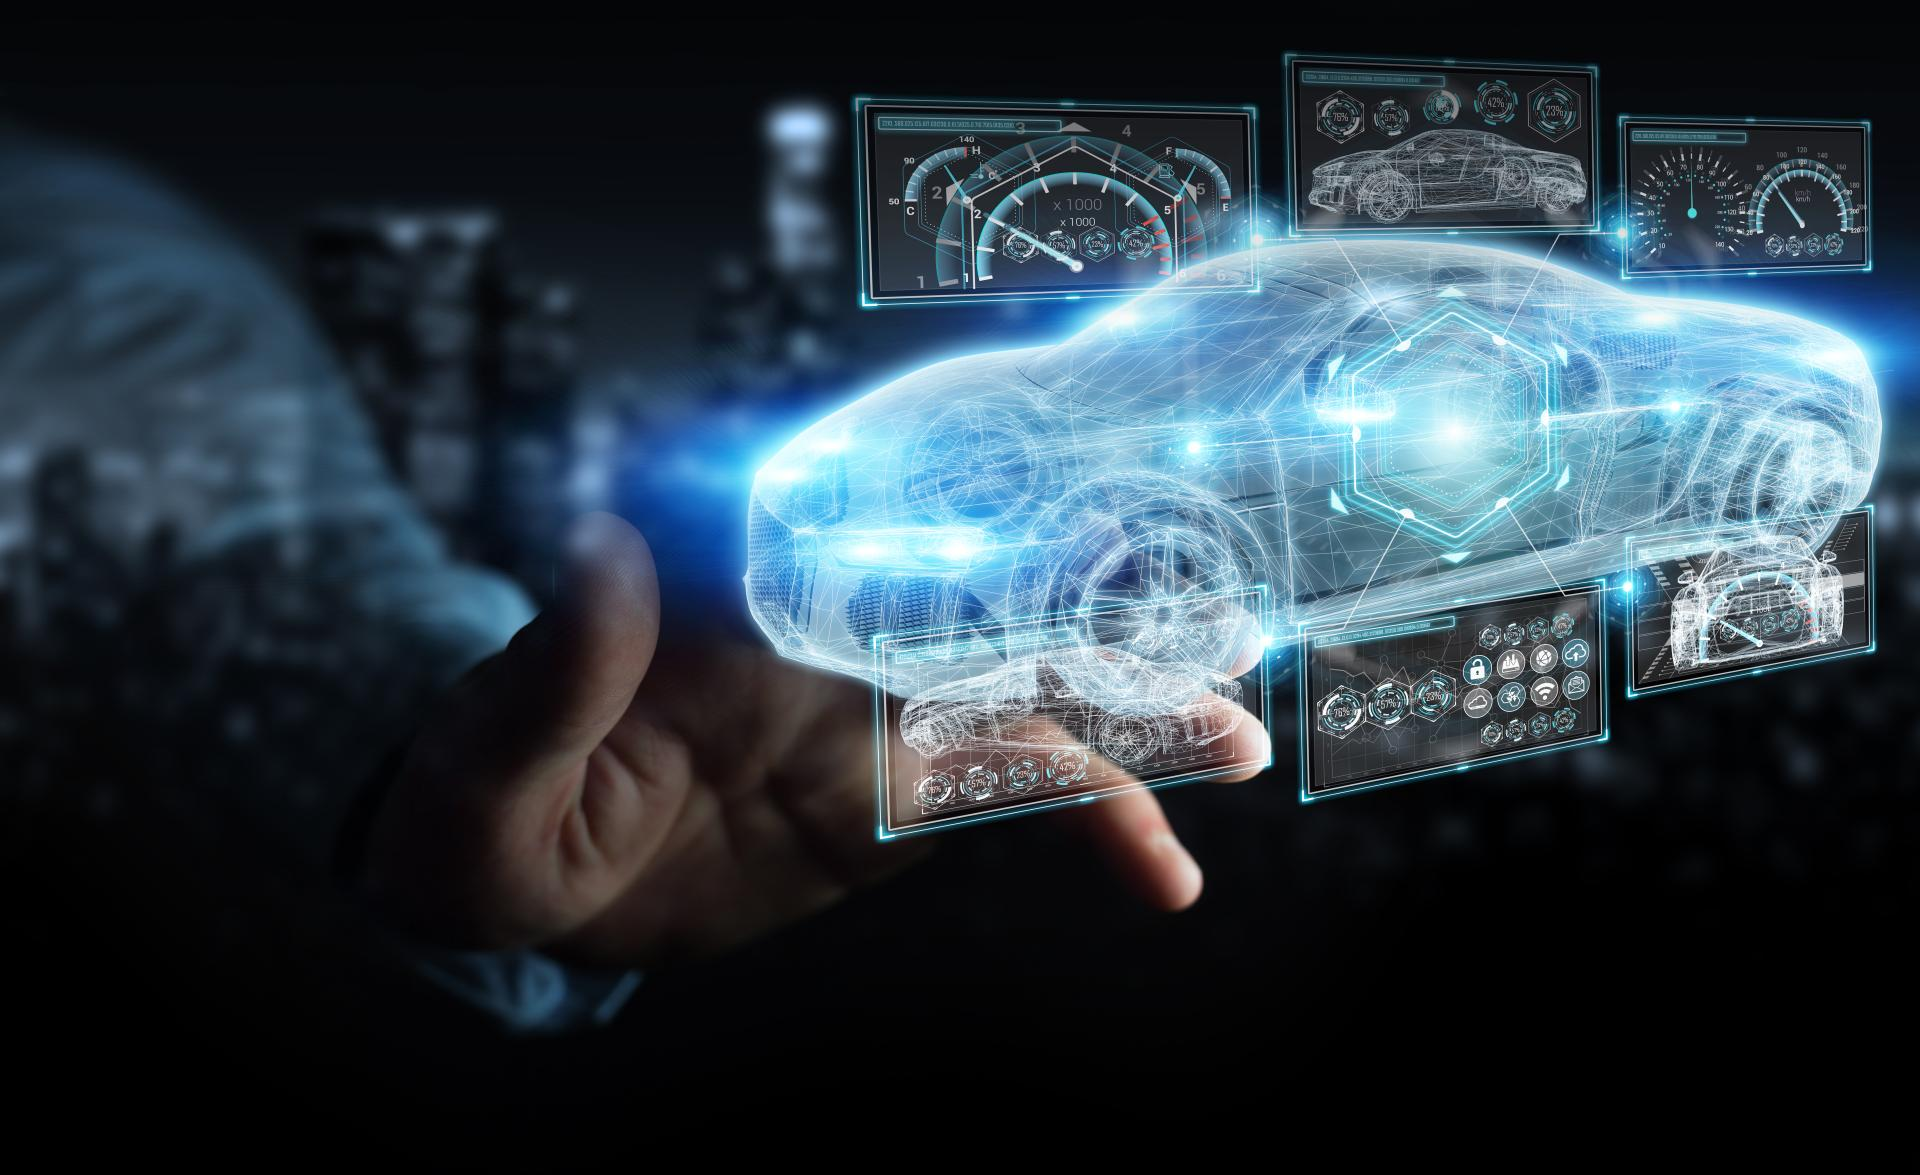 Neuartiger Akku Soll E Autos Mehr Als 1000 Km Weit Bringen Elektroauto News Net